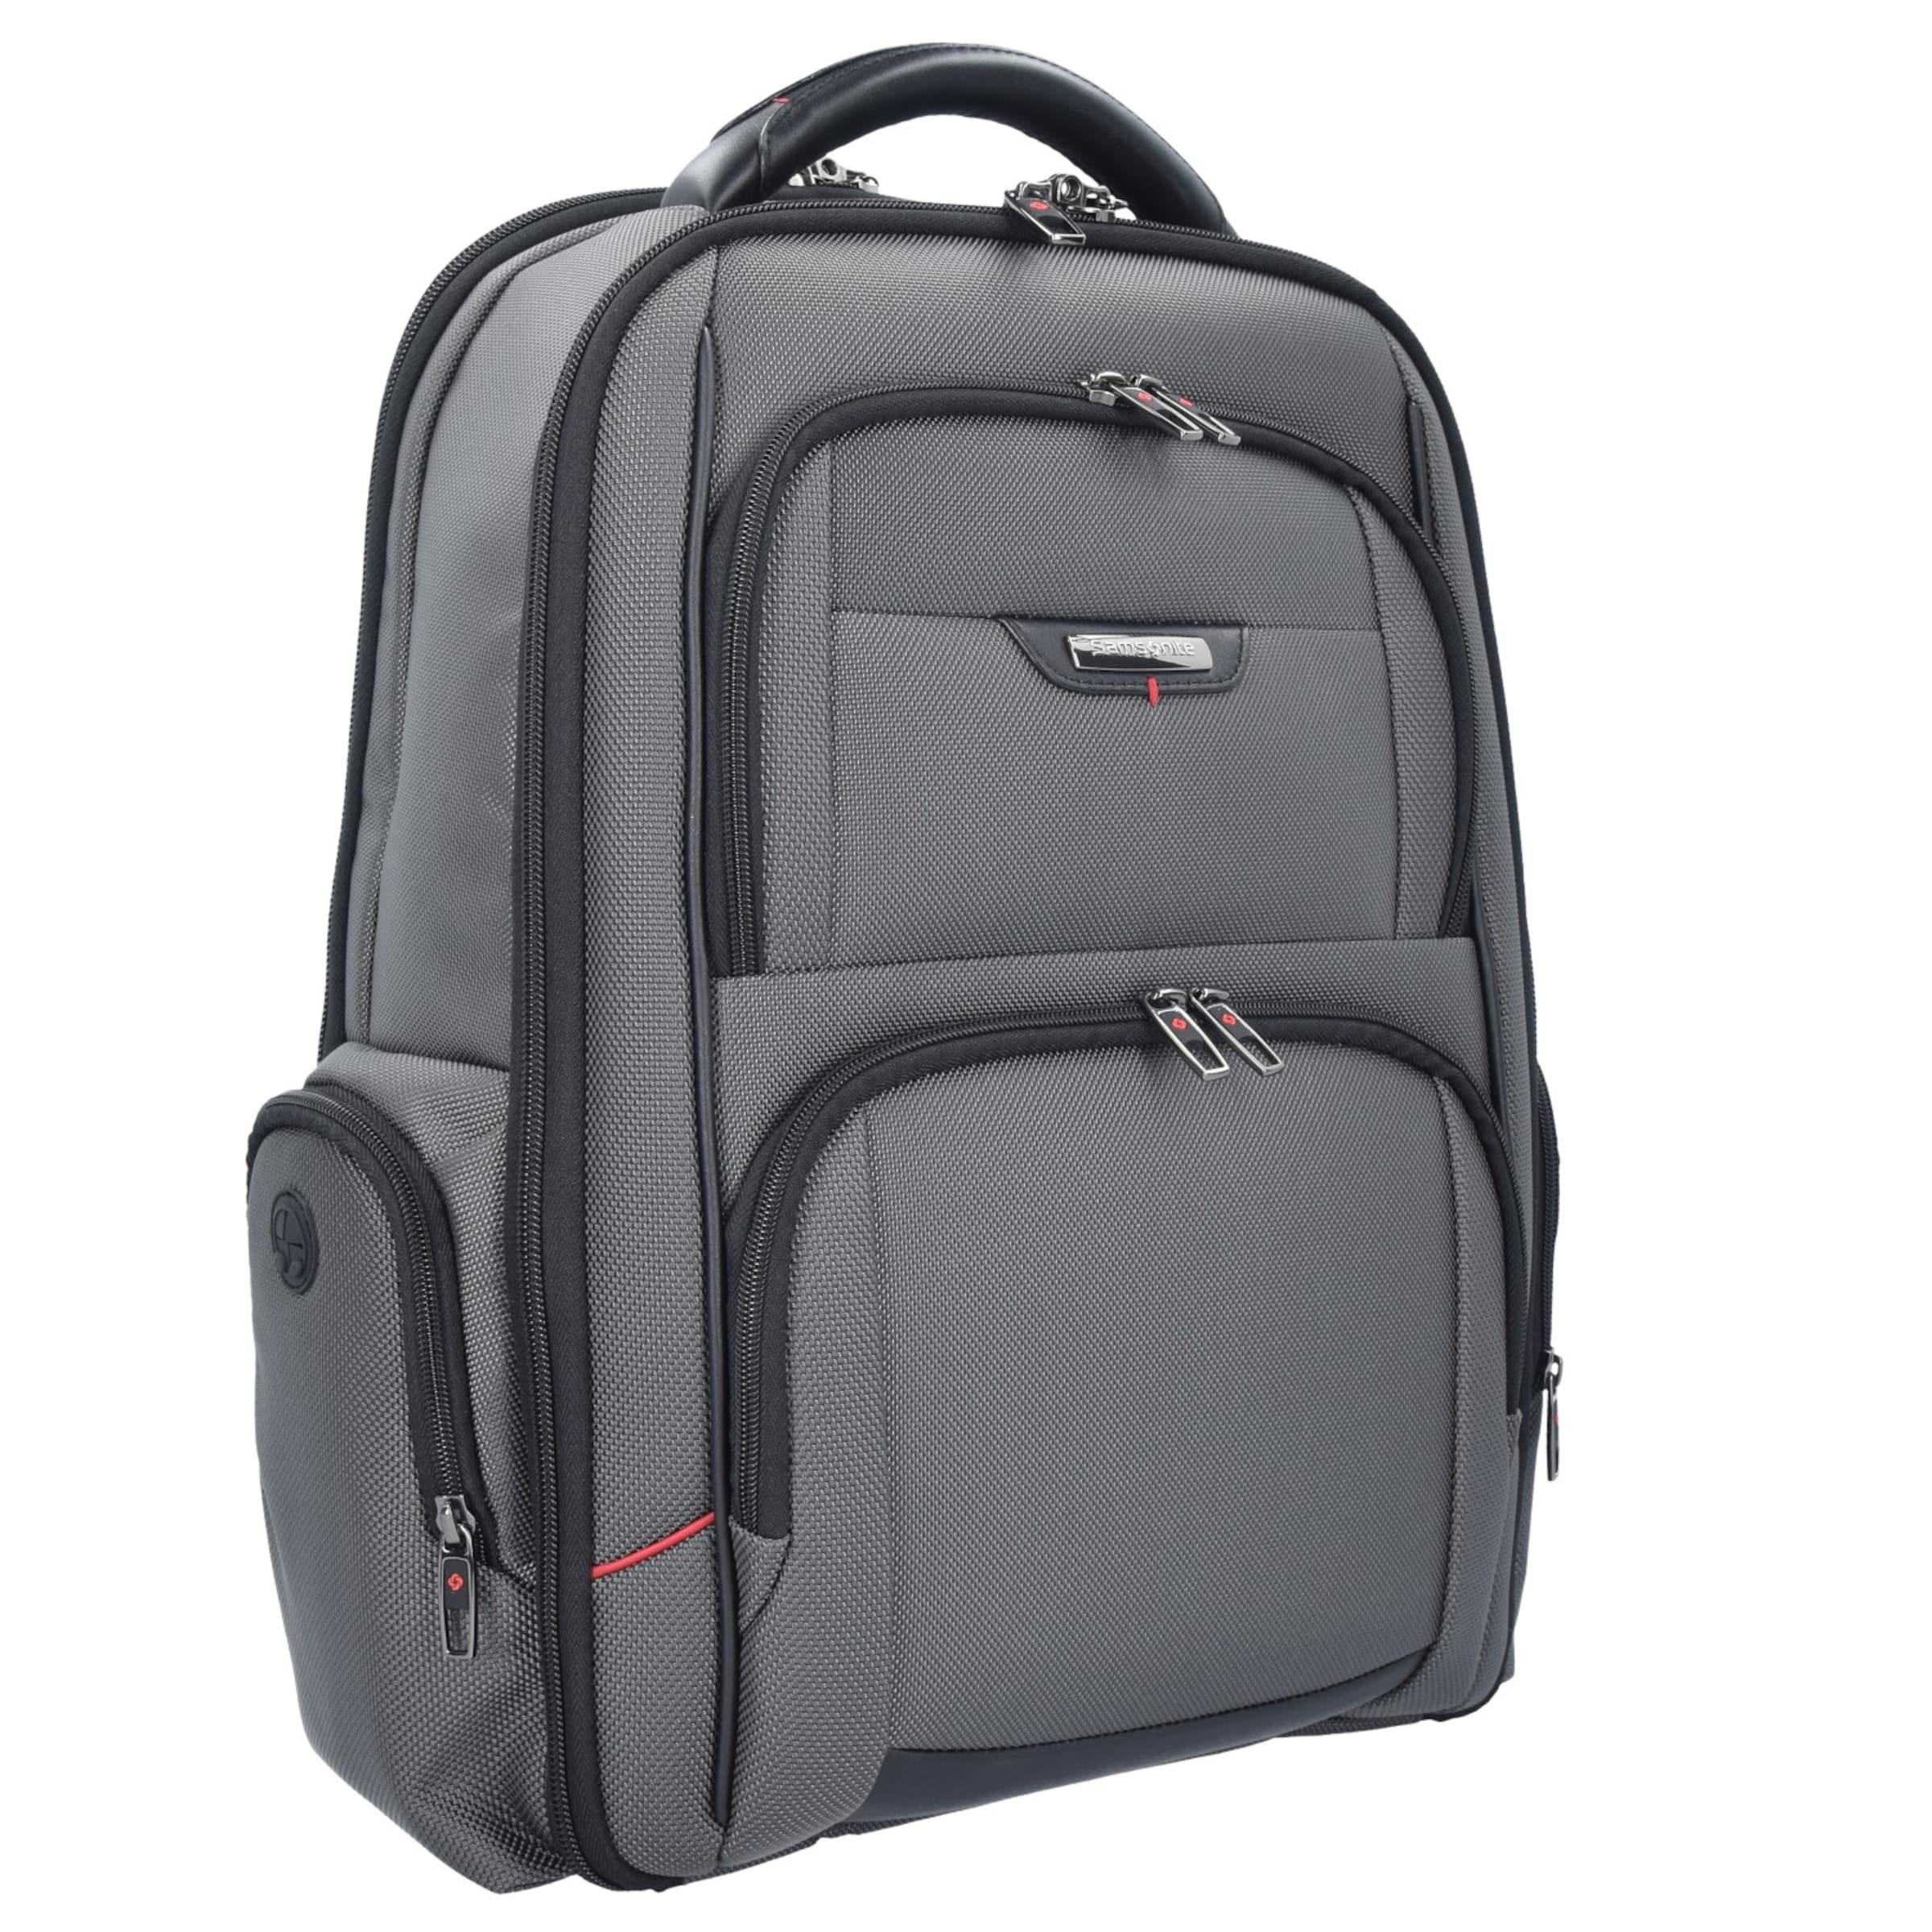 4 Laptopfach SAMSONITE cm SAMSONITE Rucksack 48 Pro DLX Pro wIIv48q